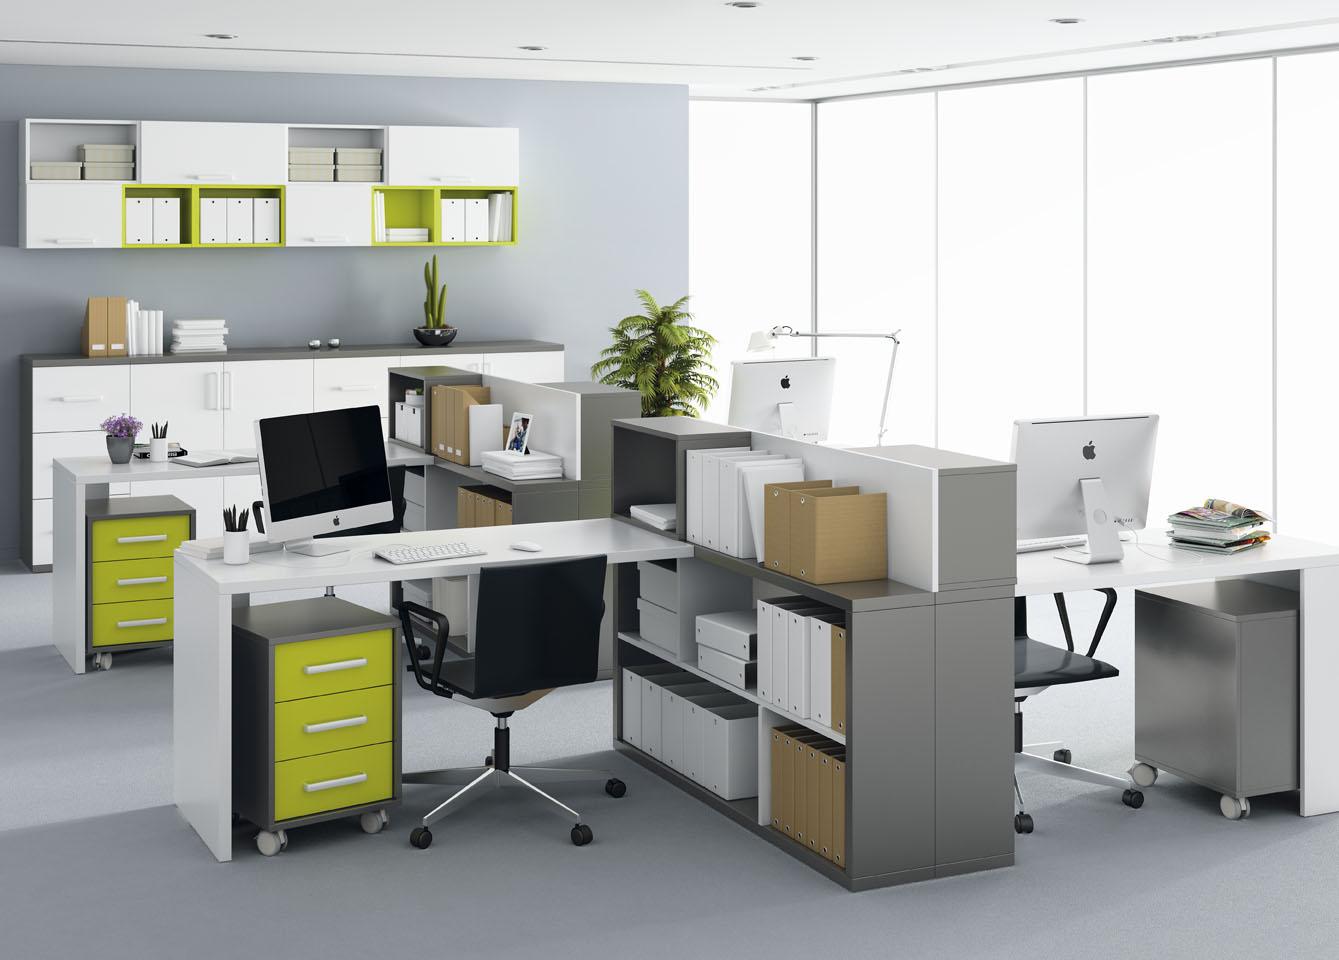 Oficina4 gestliman servicios integrales empresa de for Oficina de empleo huelva